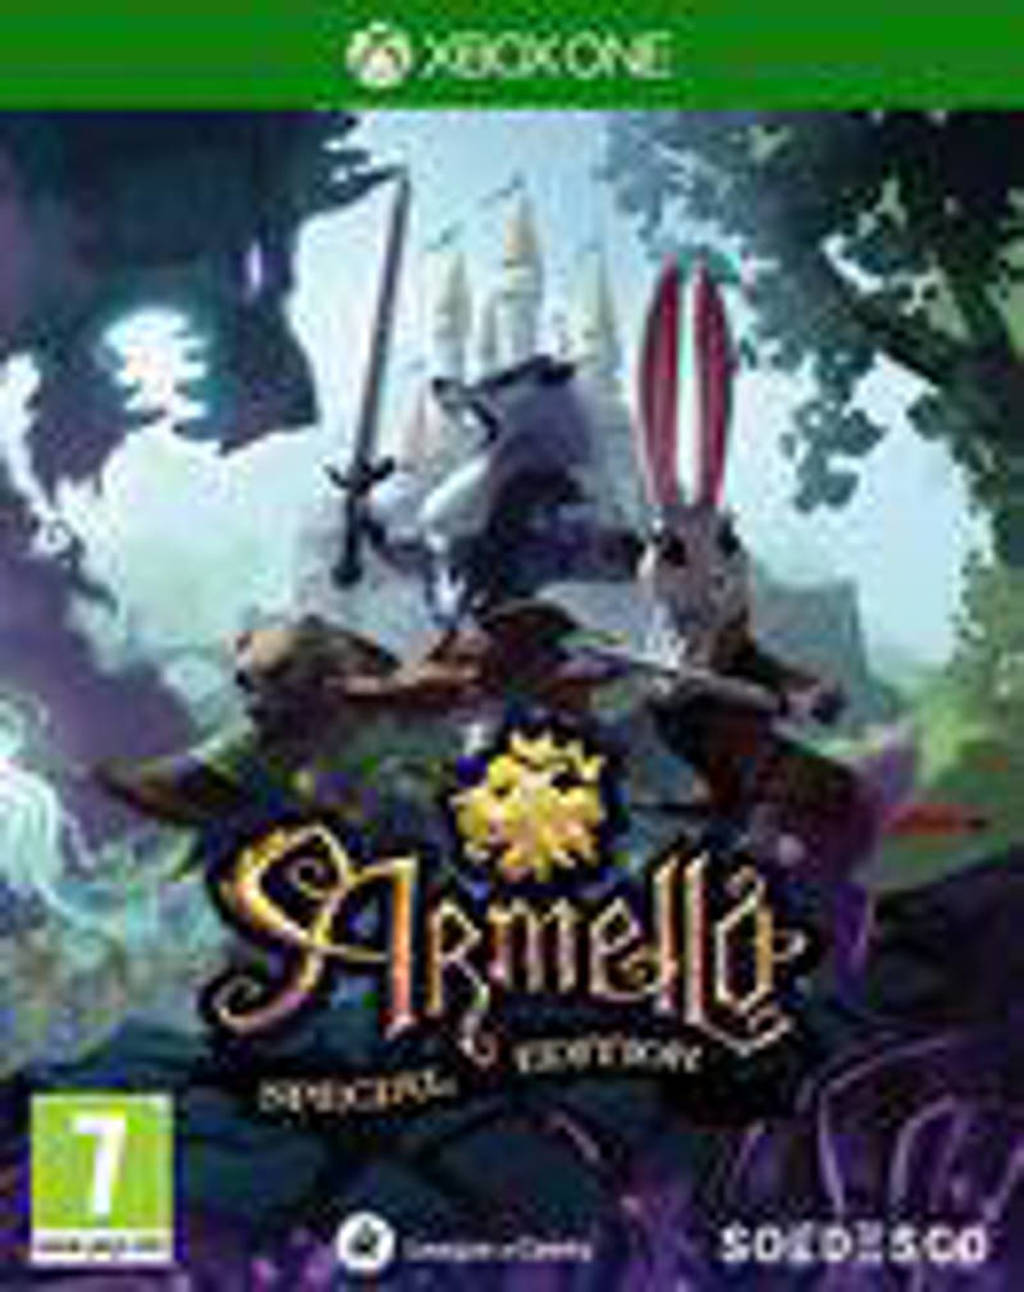 Armello (Deluxe edition) (Xbox One)